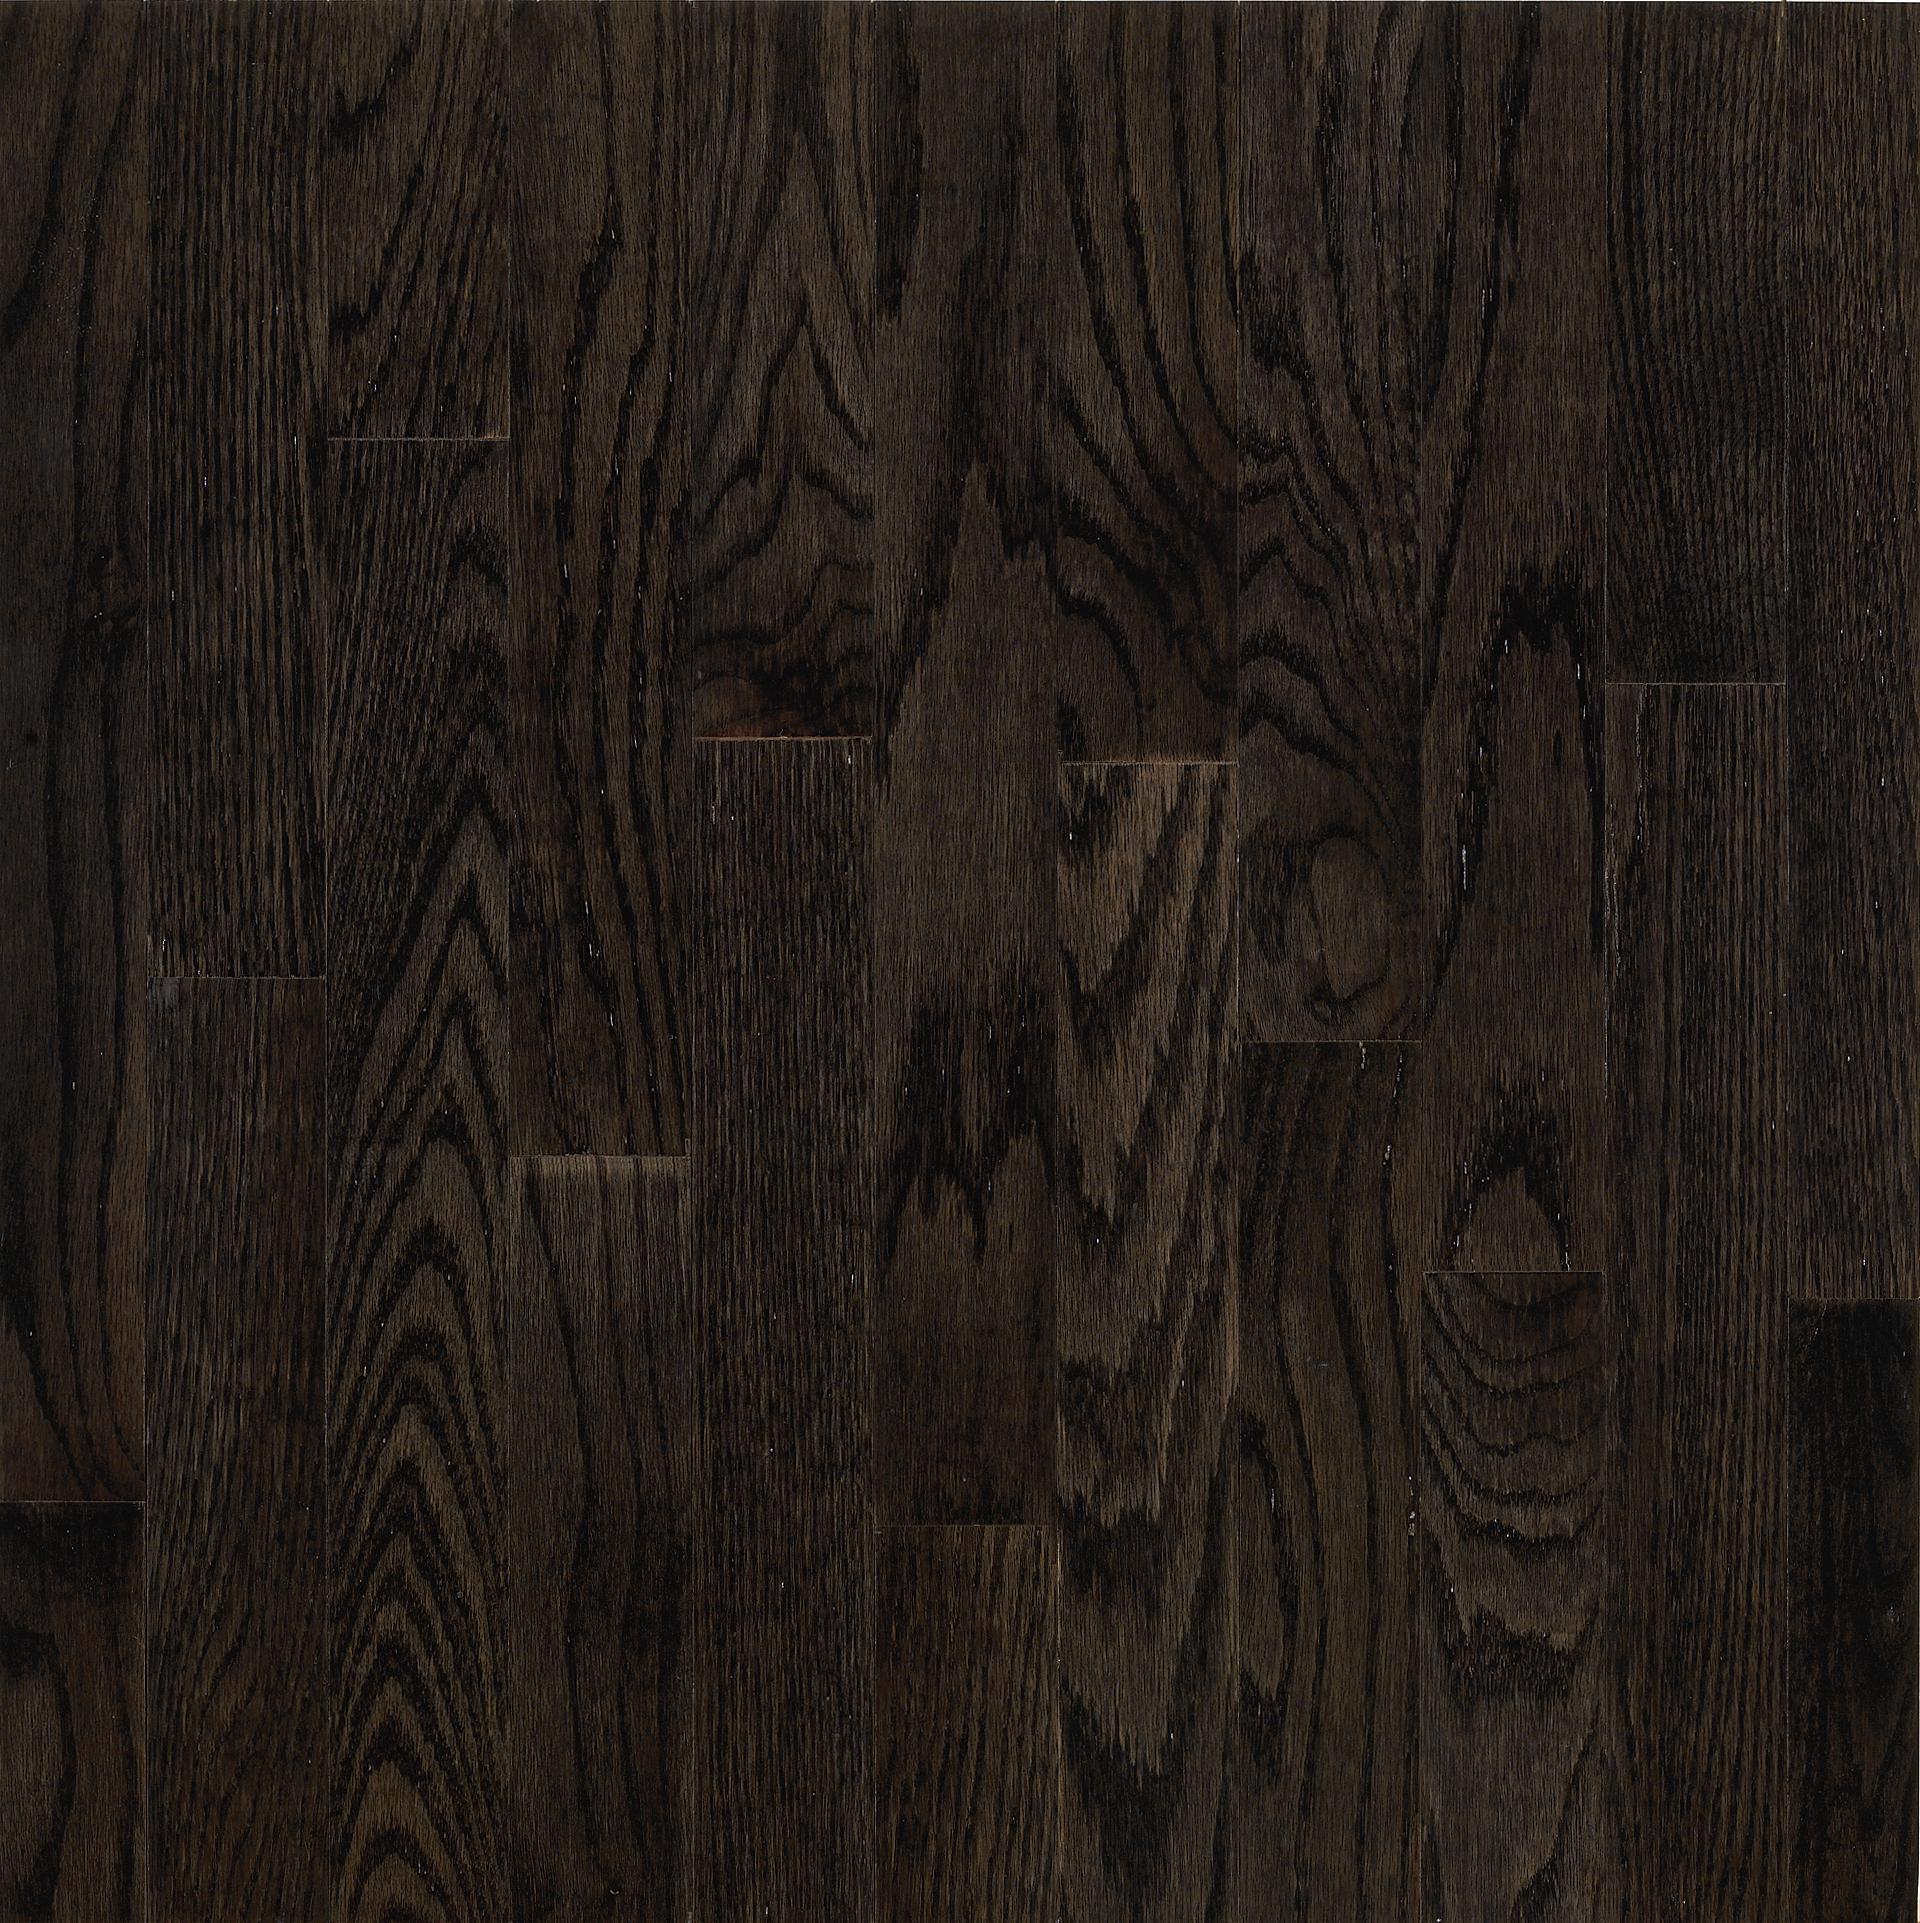 Oak Solid Hardwood Cb275